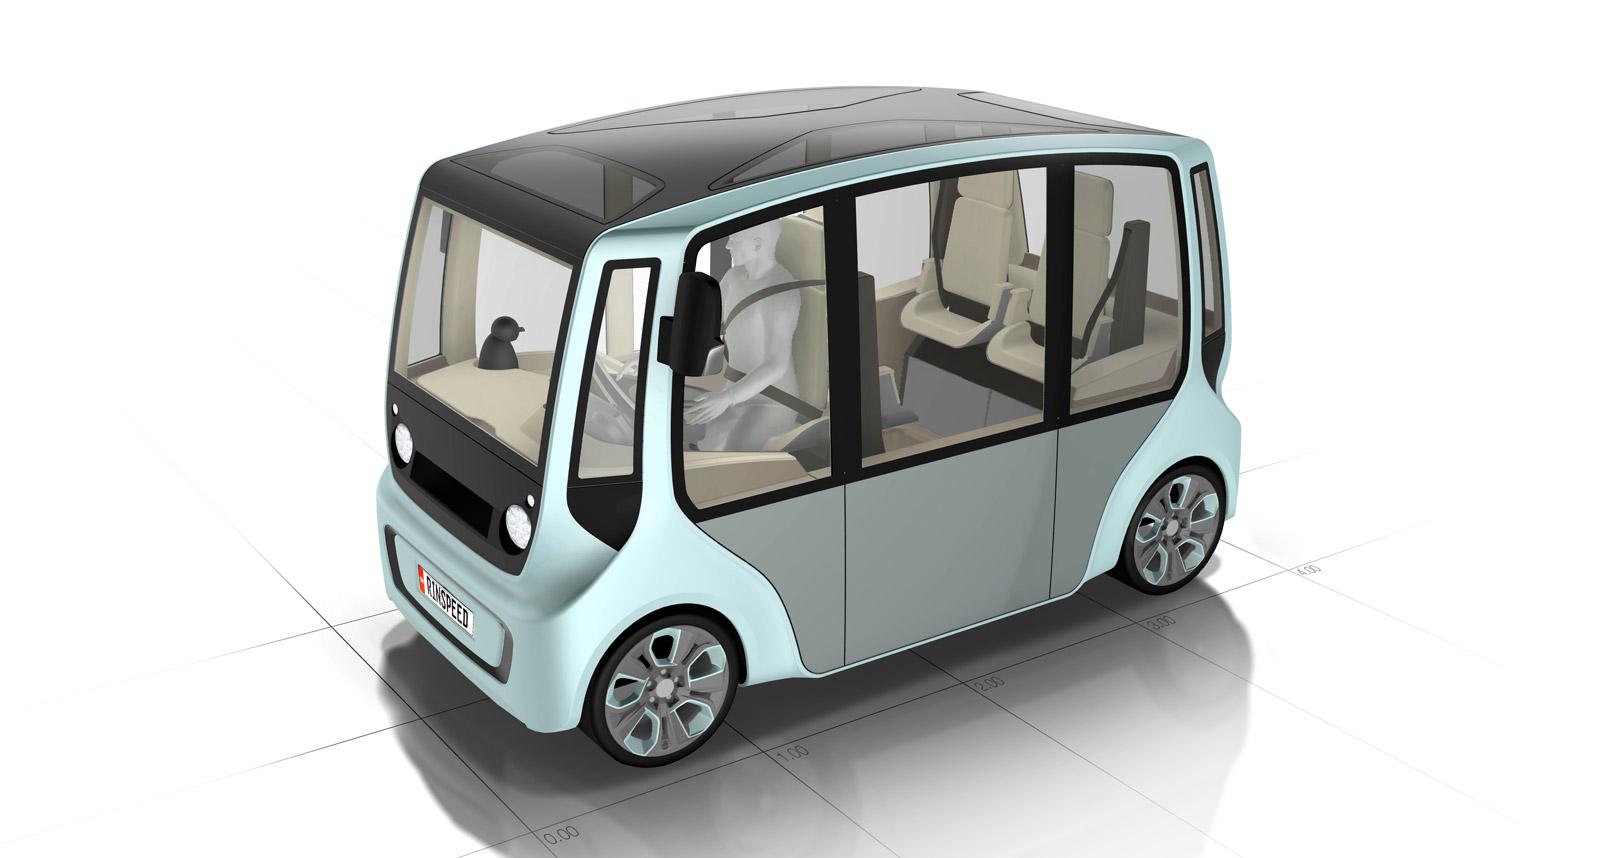 Rinspeed MicroMAX Concept: 6 Upright Seats In MINI-Sized Van